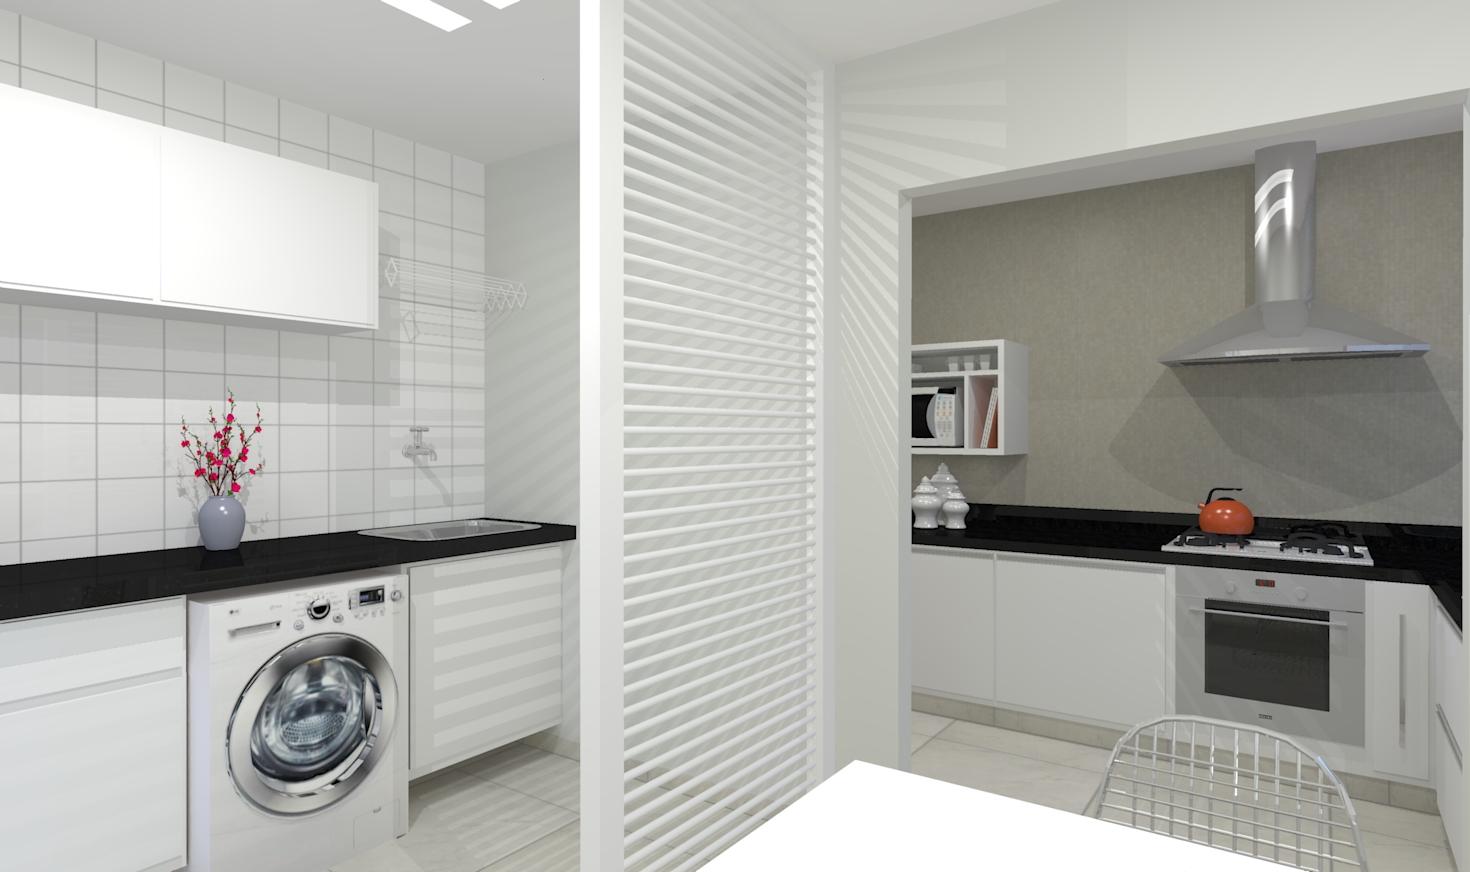 Another Image For Cozinha Americana: 15 Projetos Exclusivos Bella Kaza  #784537 1470 872